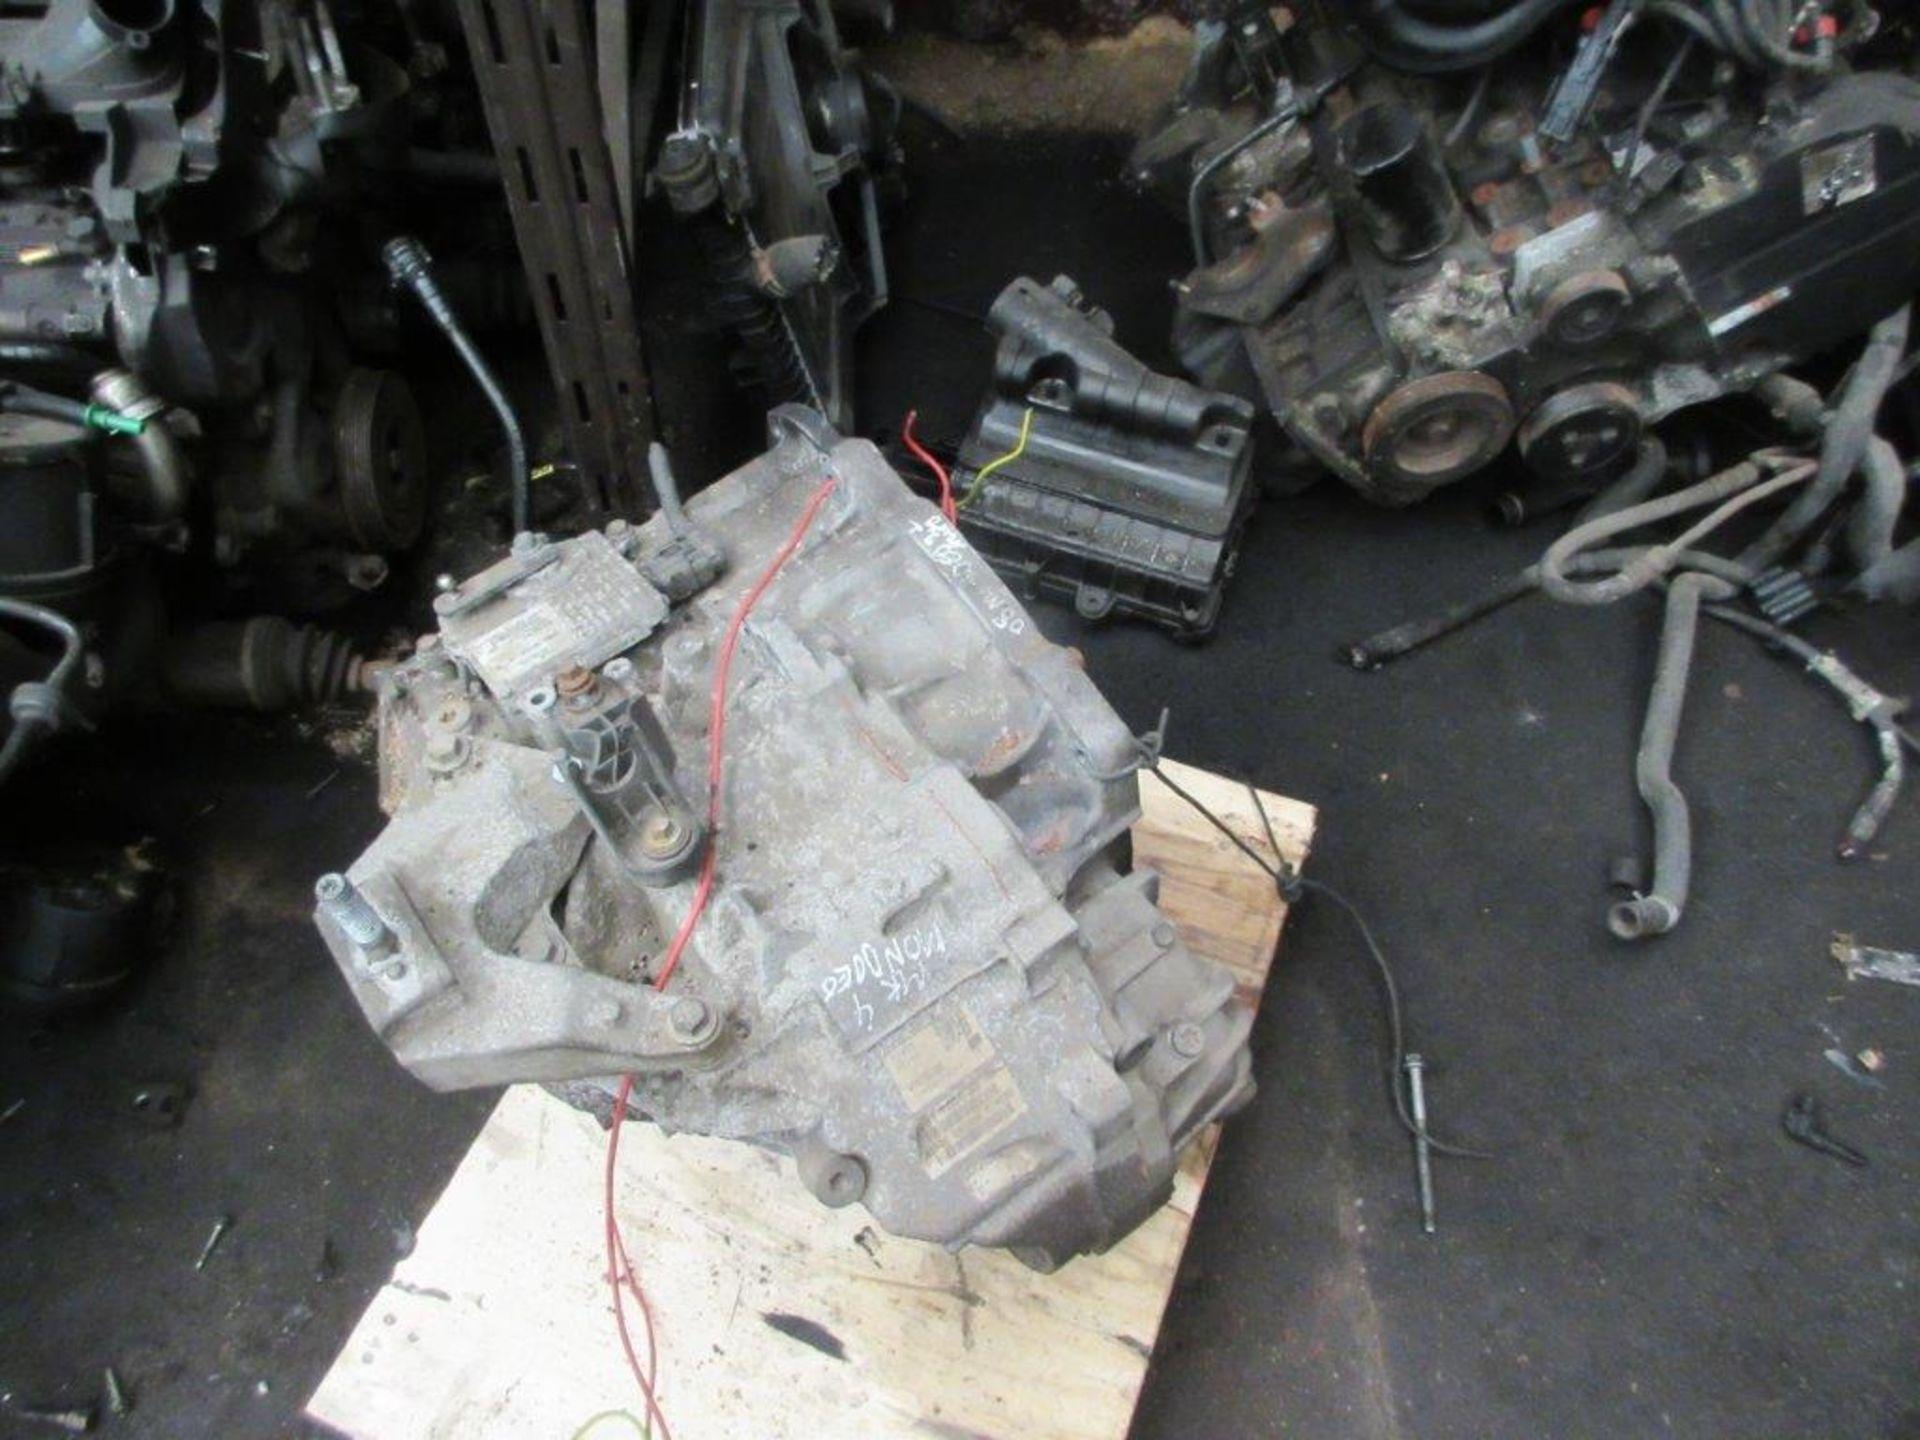 Lot 53 - 17 assorted engines including F6JB Mk 6 Fiesta 1.4 TDCi, Citroen 56 Clio 1.4P, BJB 05 Altea 1.9D, Mk